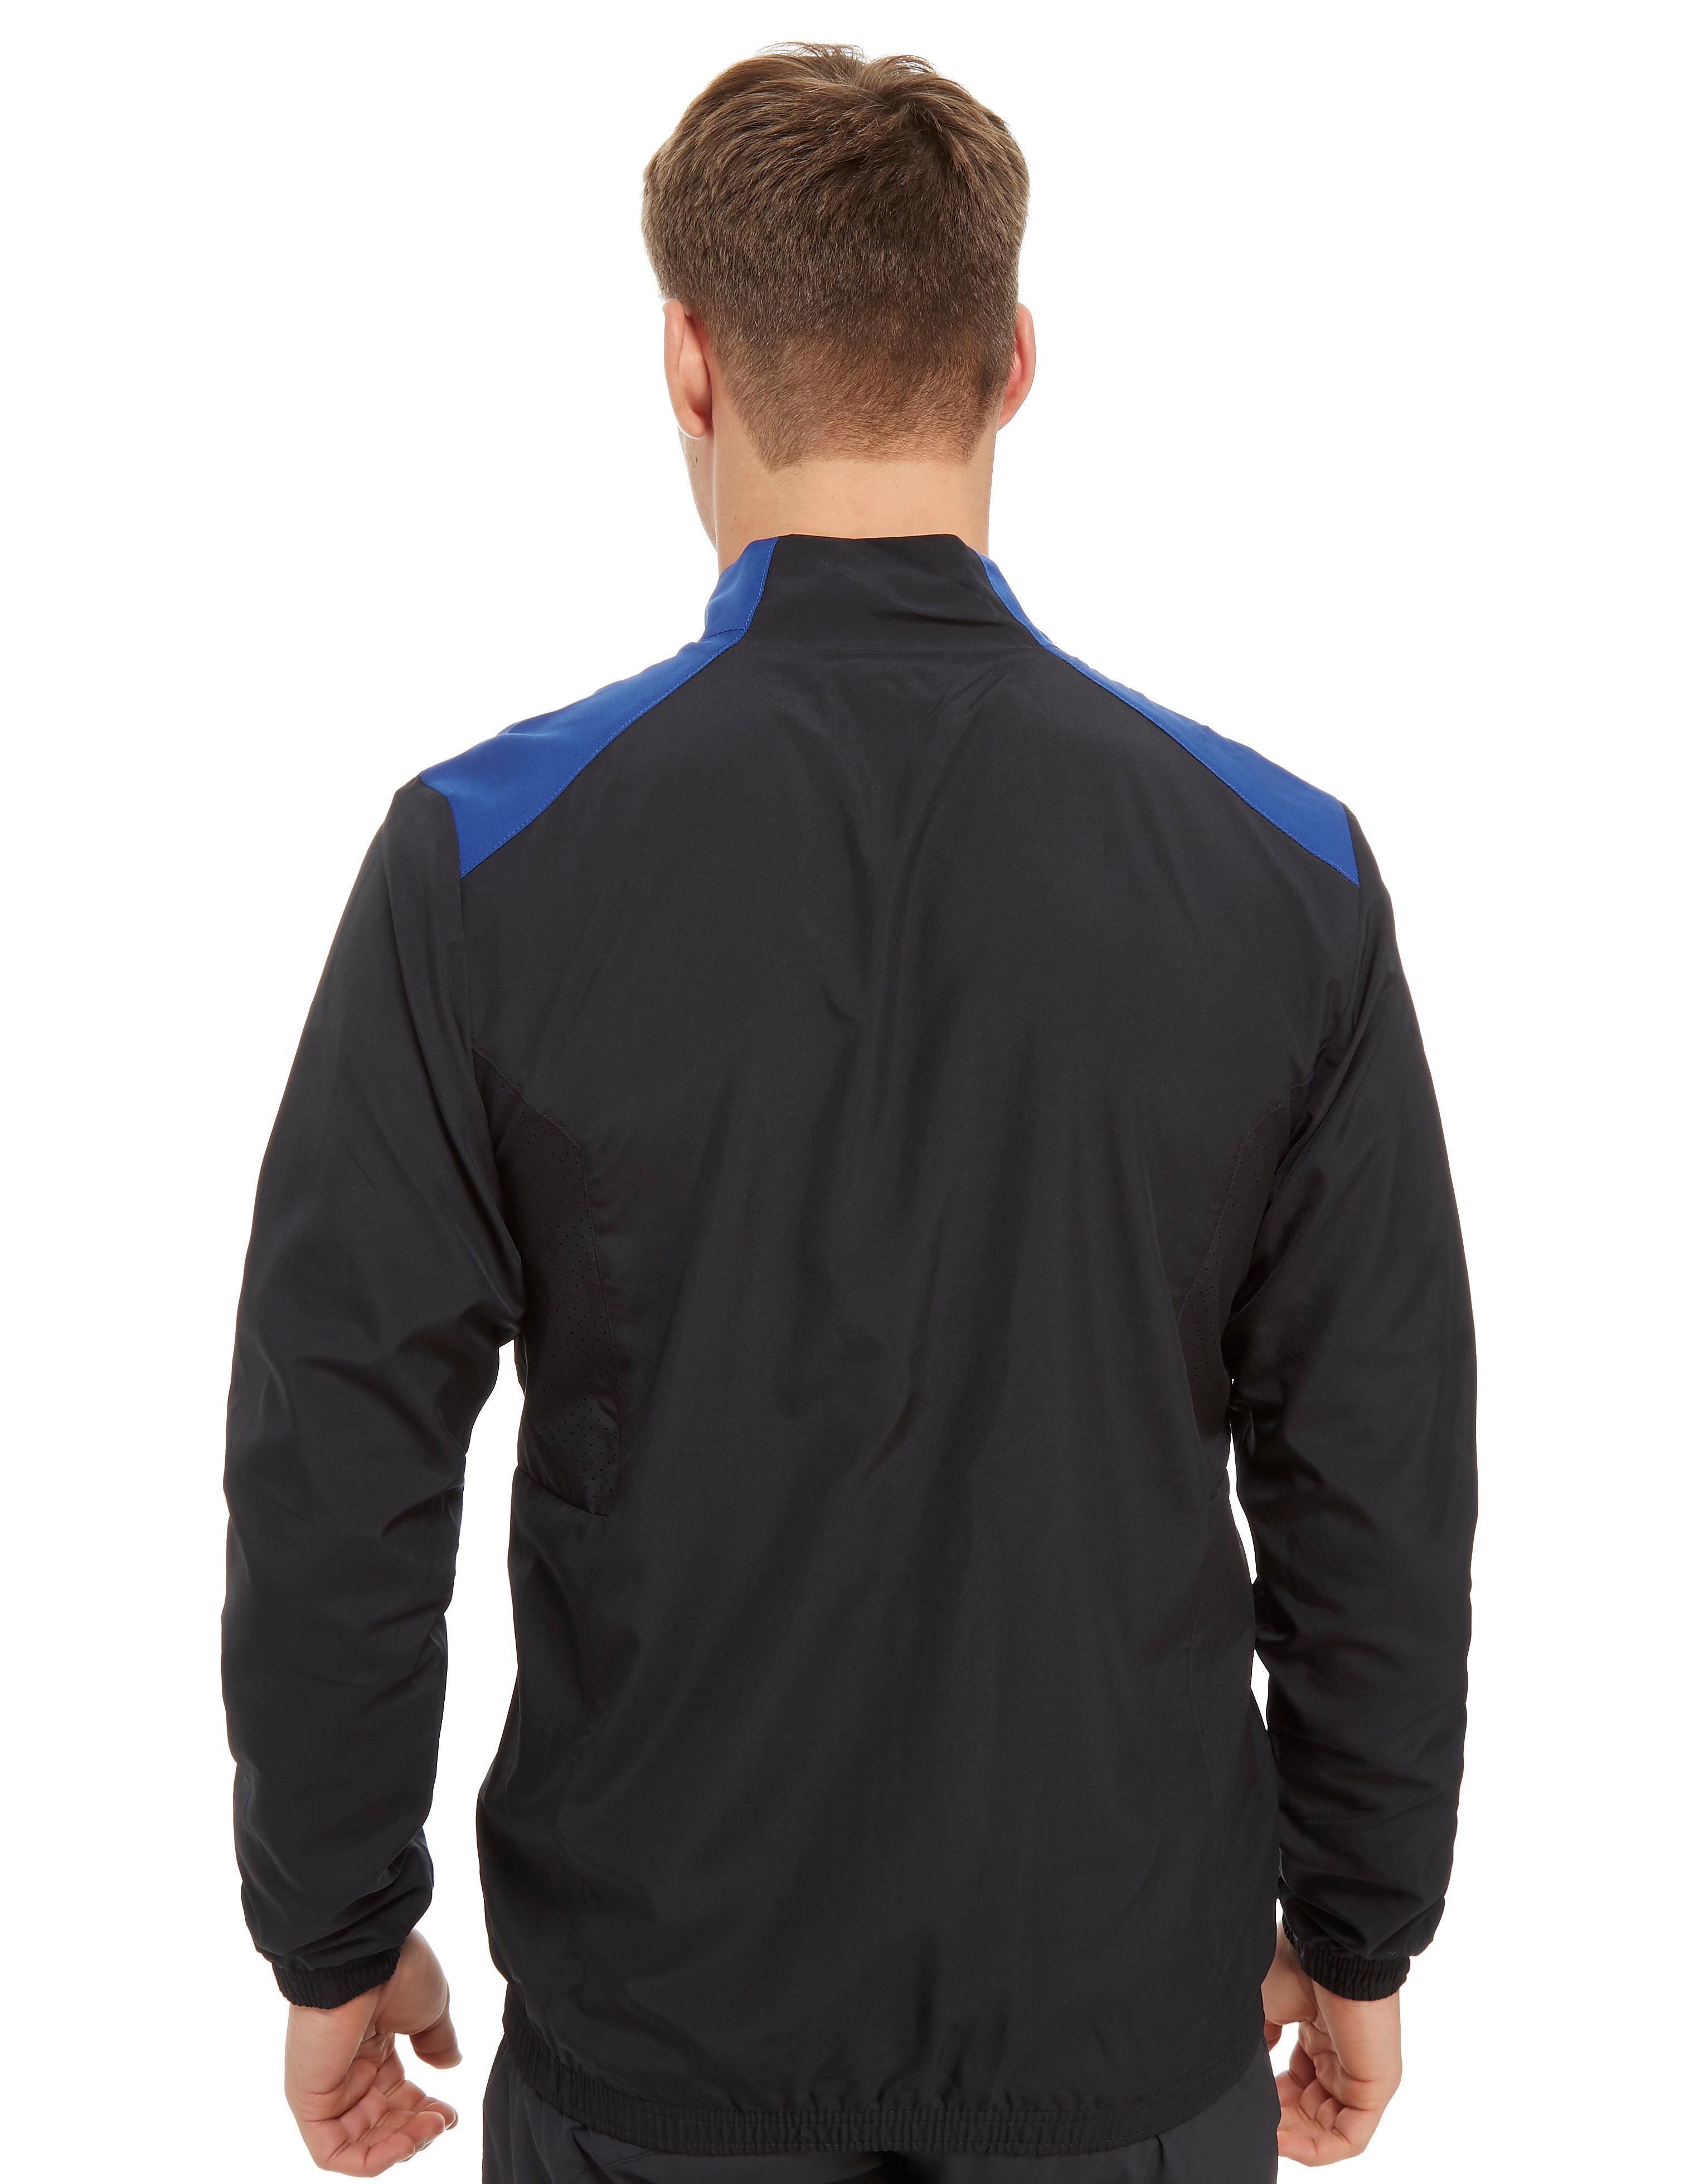 Umbro Everton FC Woven Jacket